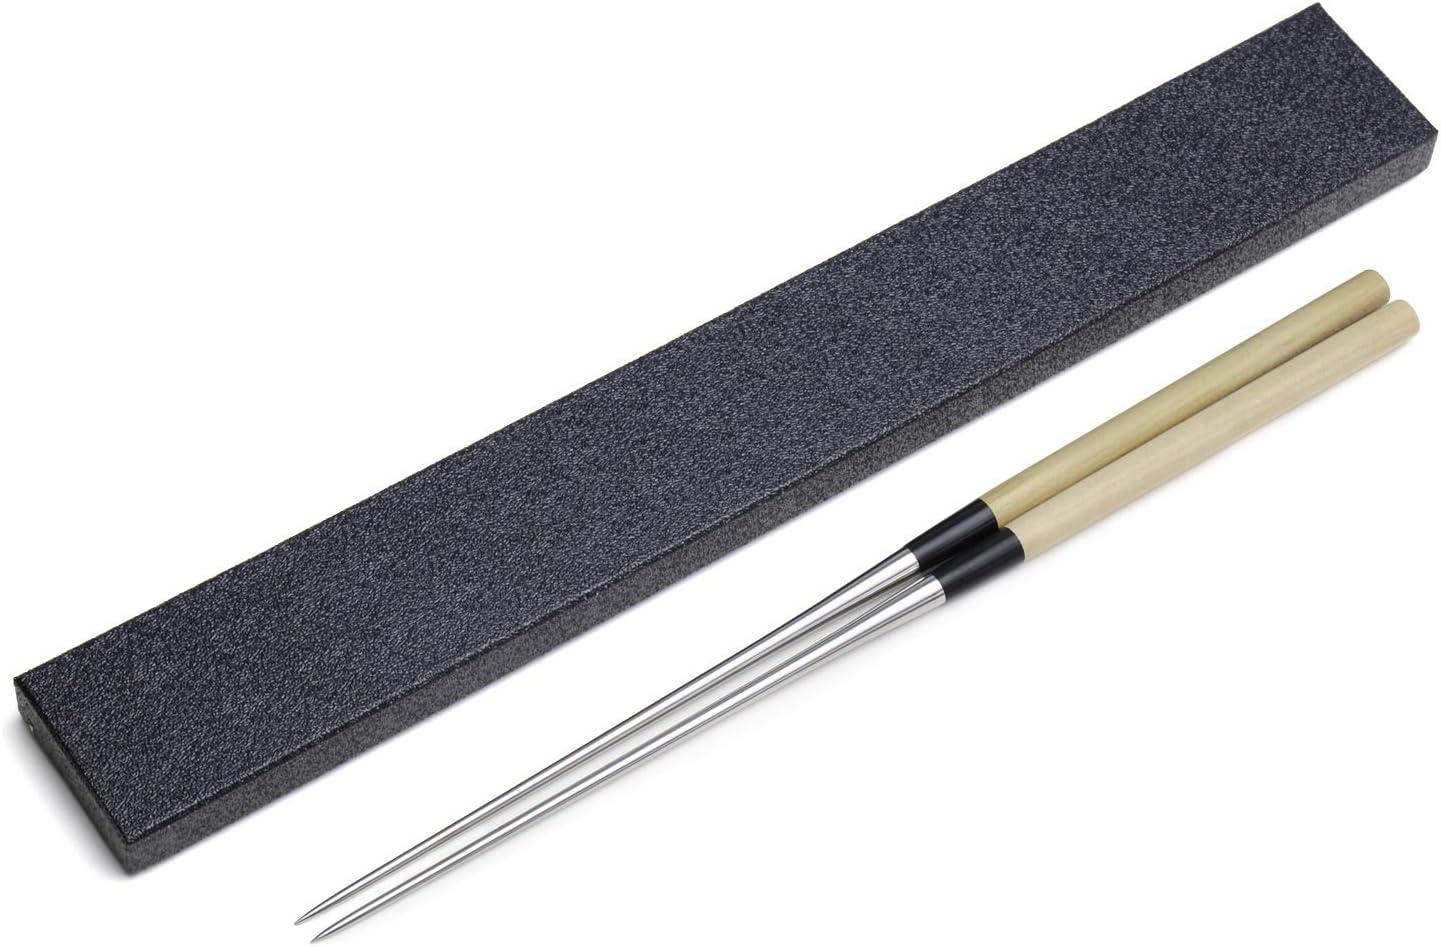 Yoshihiro Moribashi Chopsticks Japanese Sushi Chefs Traditional Garnishing Plating Tweezers Magnolia Handle 6.5 In 165mm